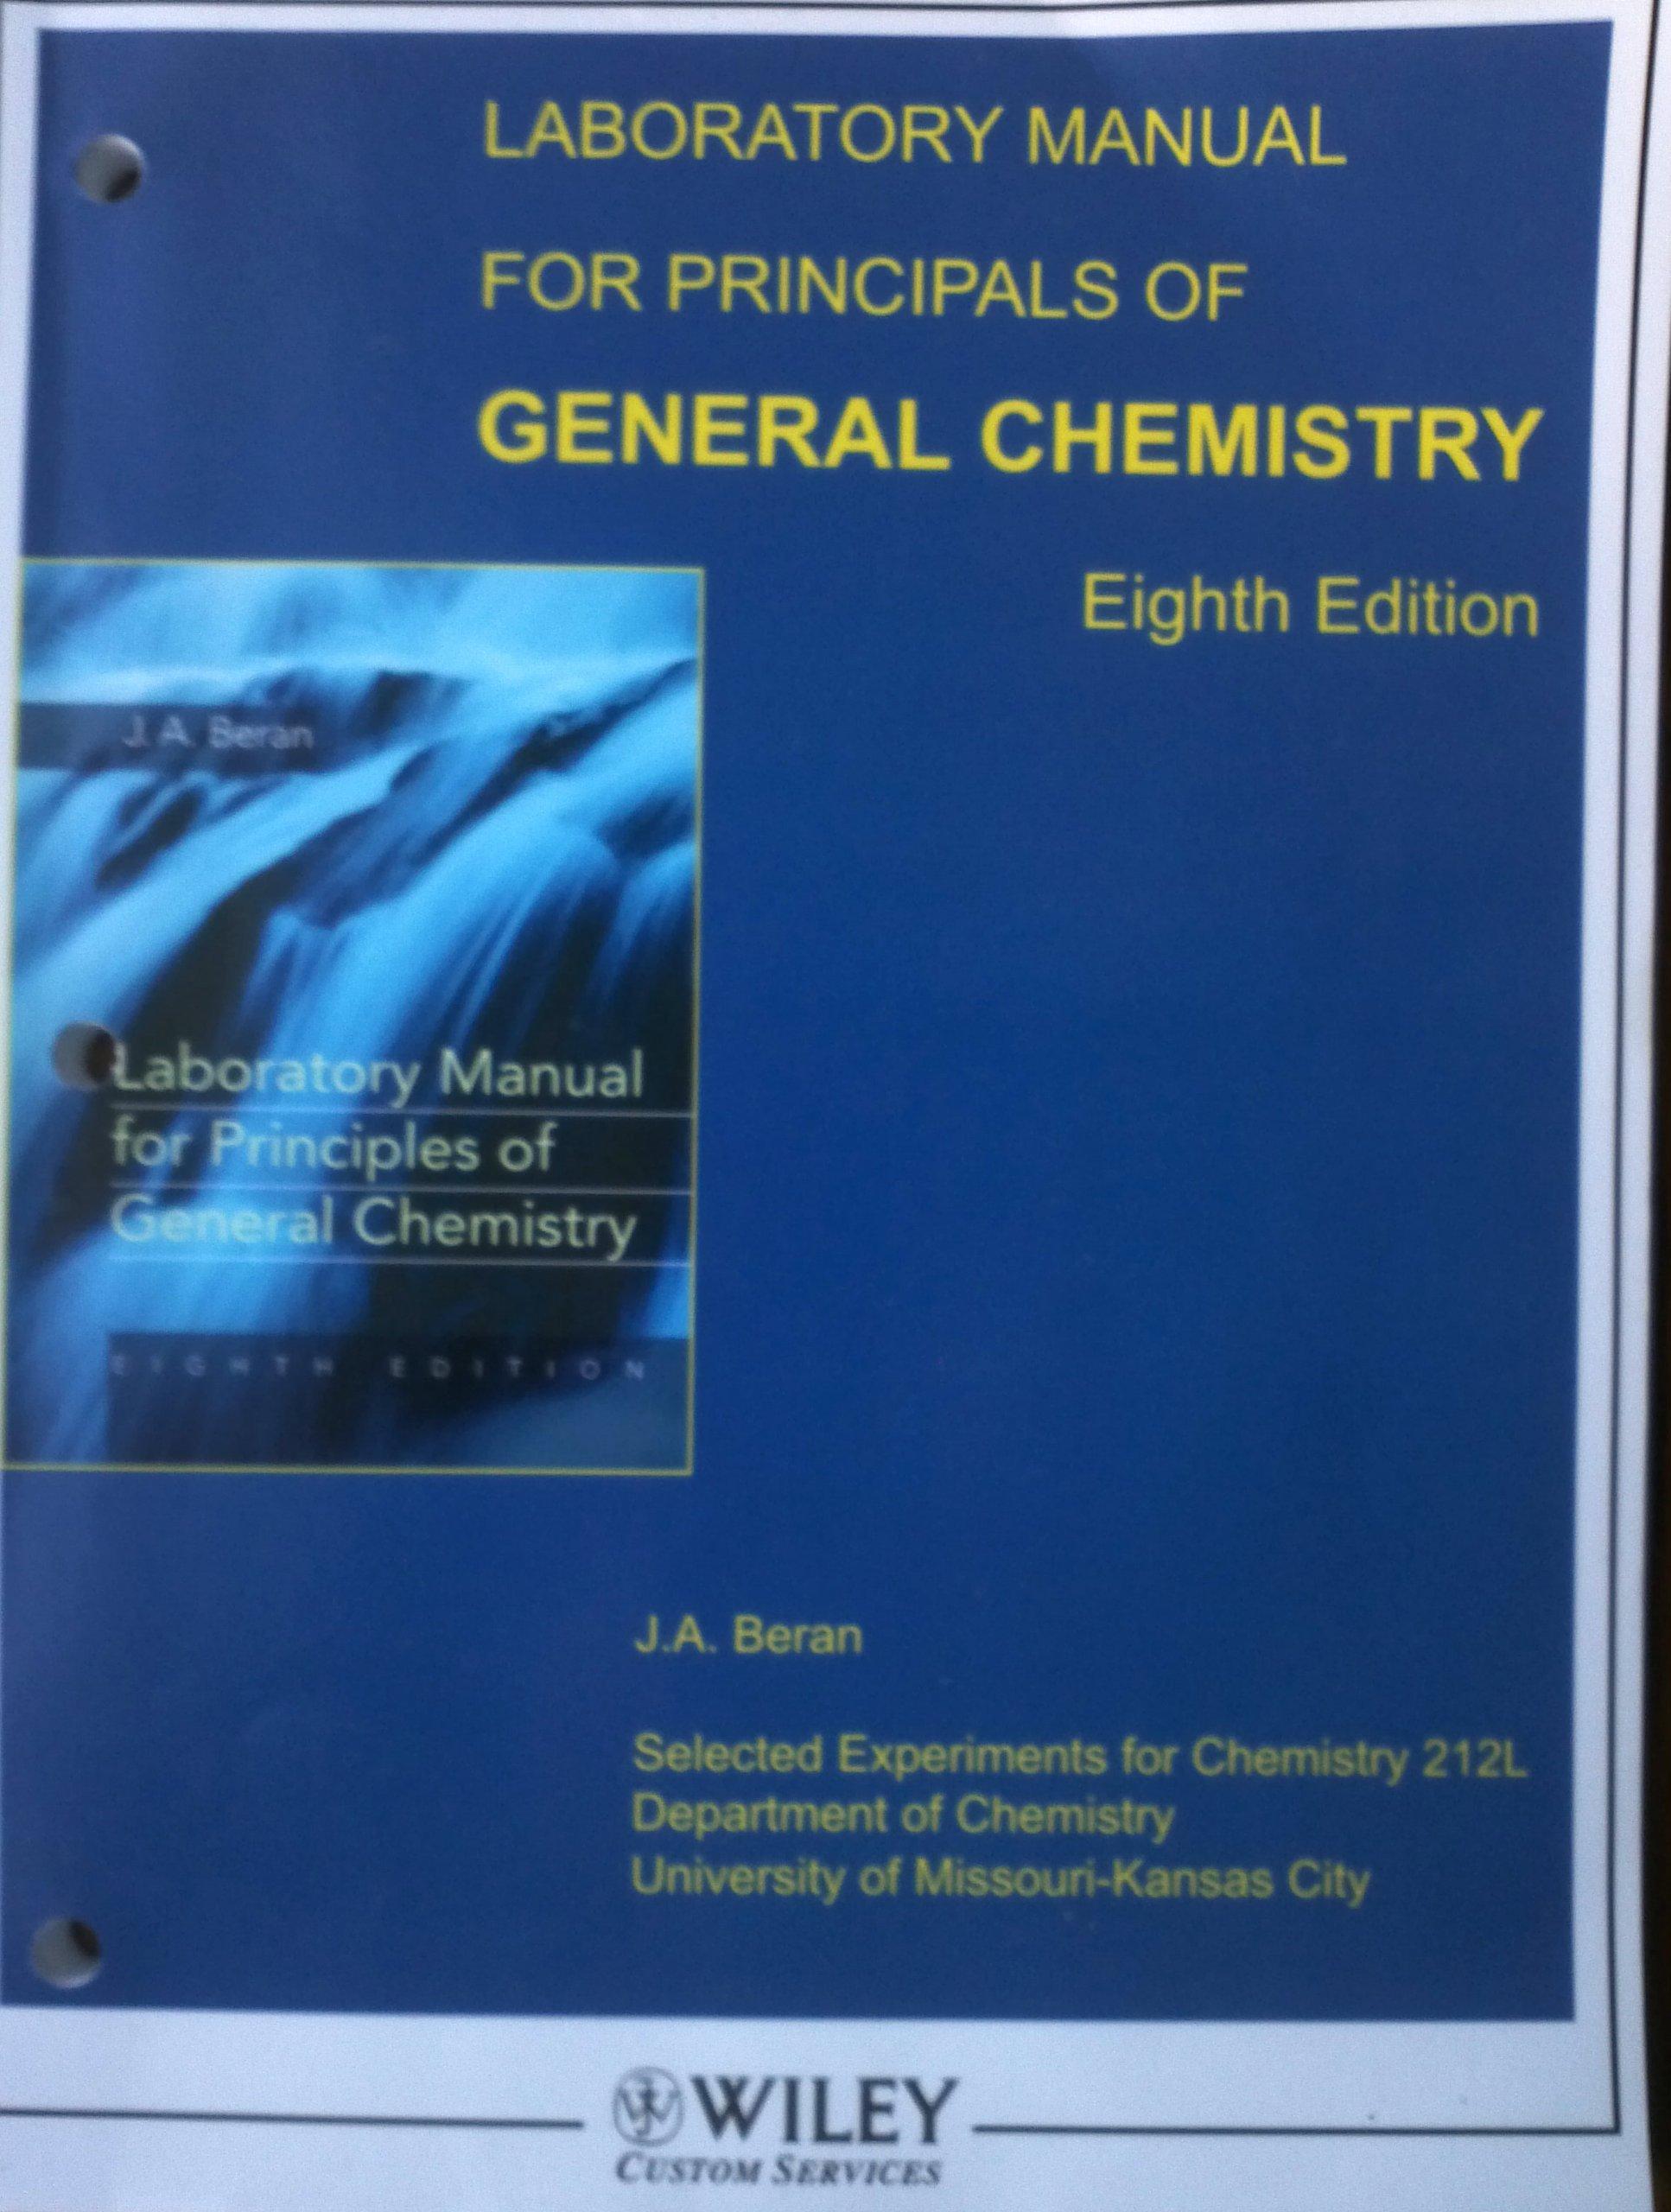 Laboratory Manual for Principles of General Chemistry, 8th Edition Chem 212  University of Missouri: J.A. Beran: 9780470421963: Amazon.com: Books